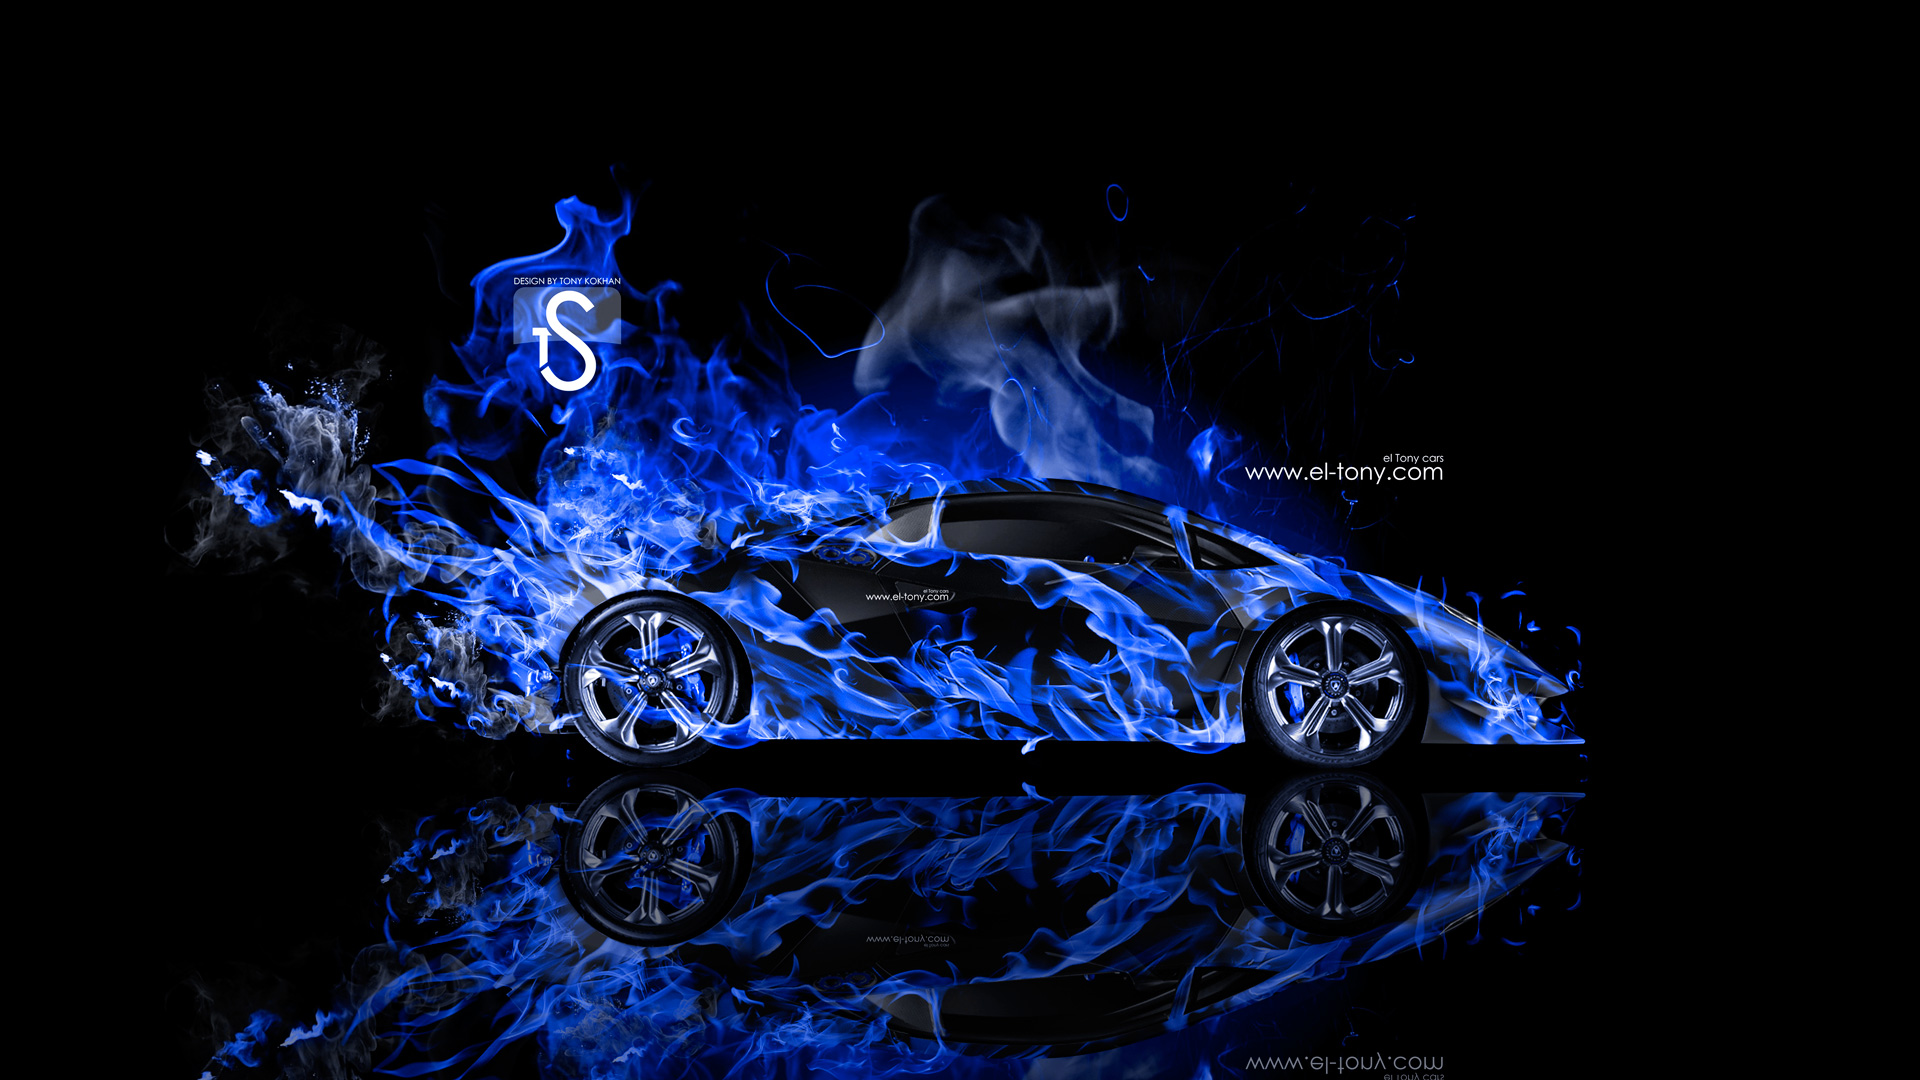 Lamborghini Sesto Elemento Blue Fire Abstract Car 2014 HD Wallpapers ...